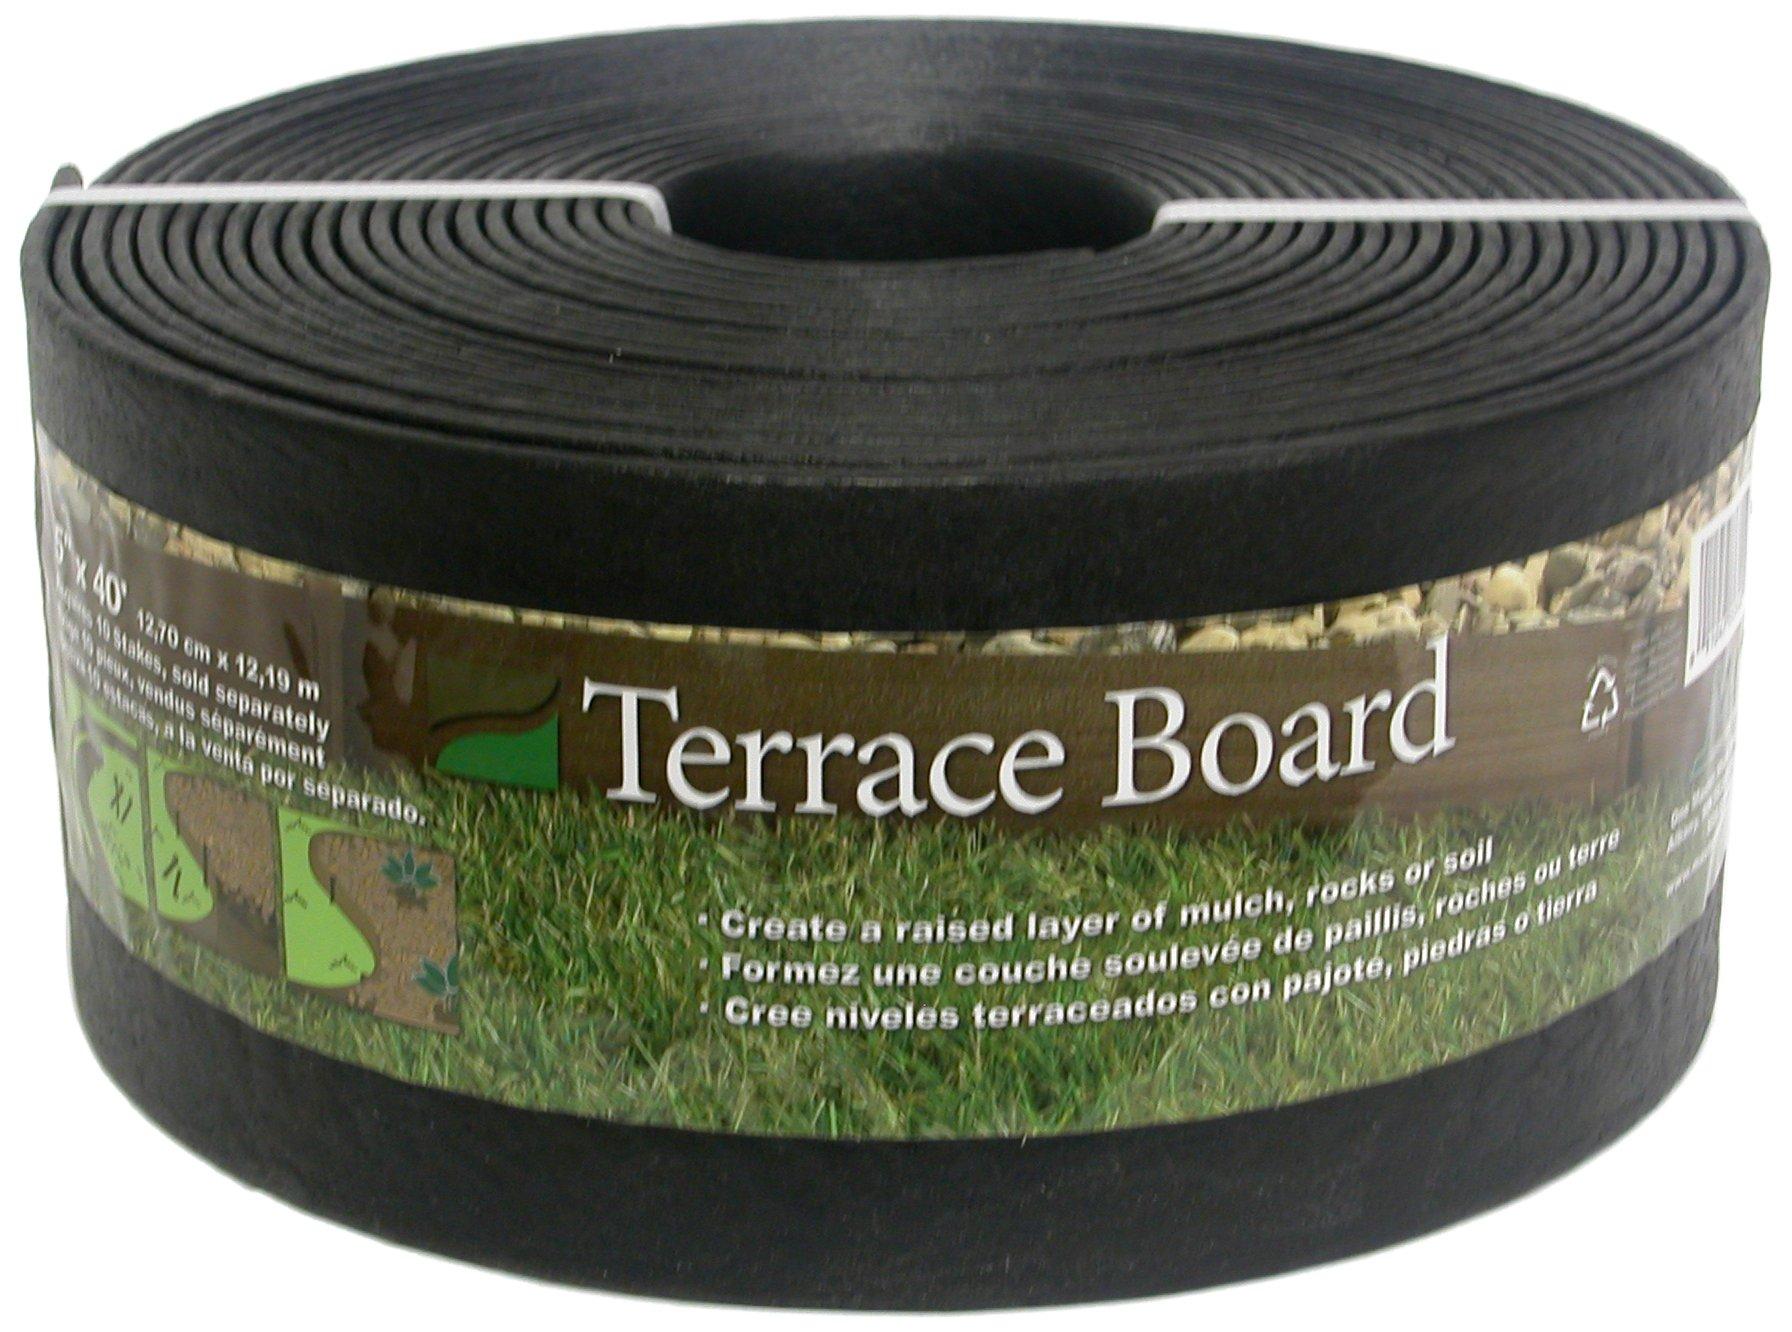 Master Mark Plastics 95440 Terrace Board Landscape Edging Coil 5 Inch by 40 Foot, Black